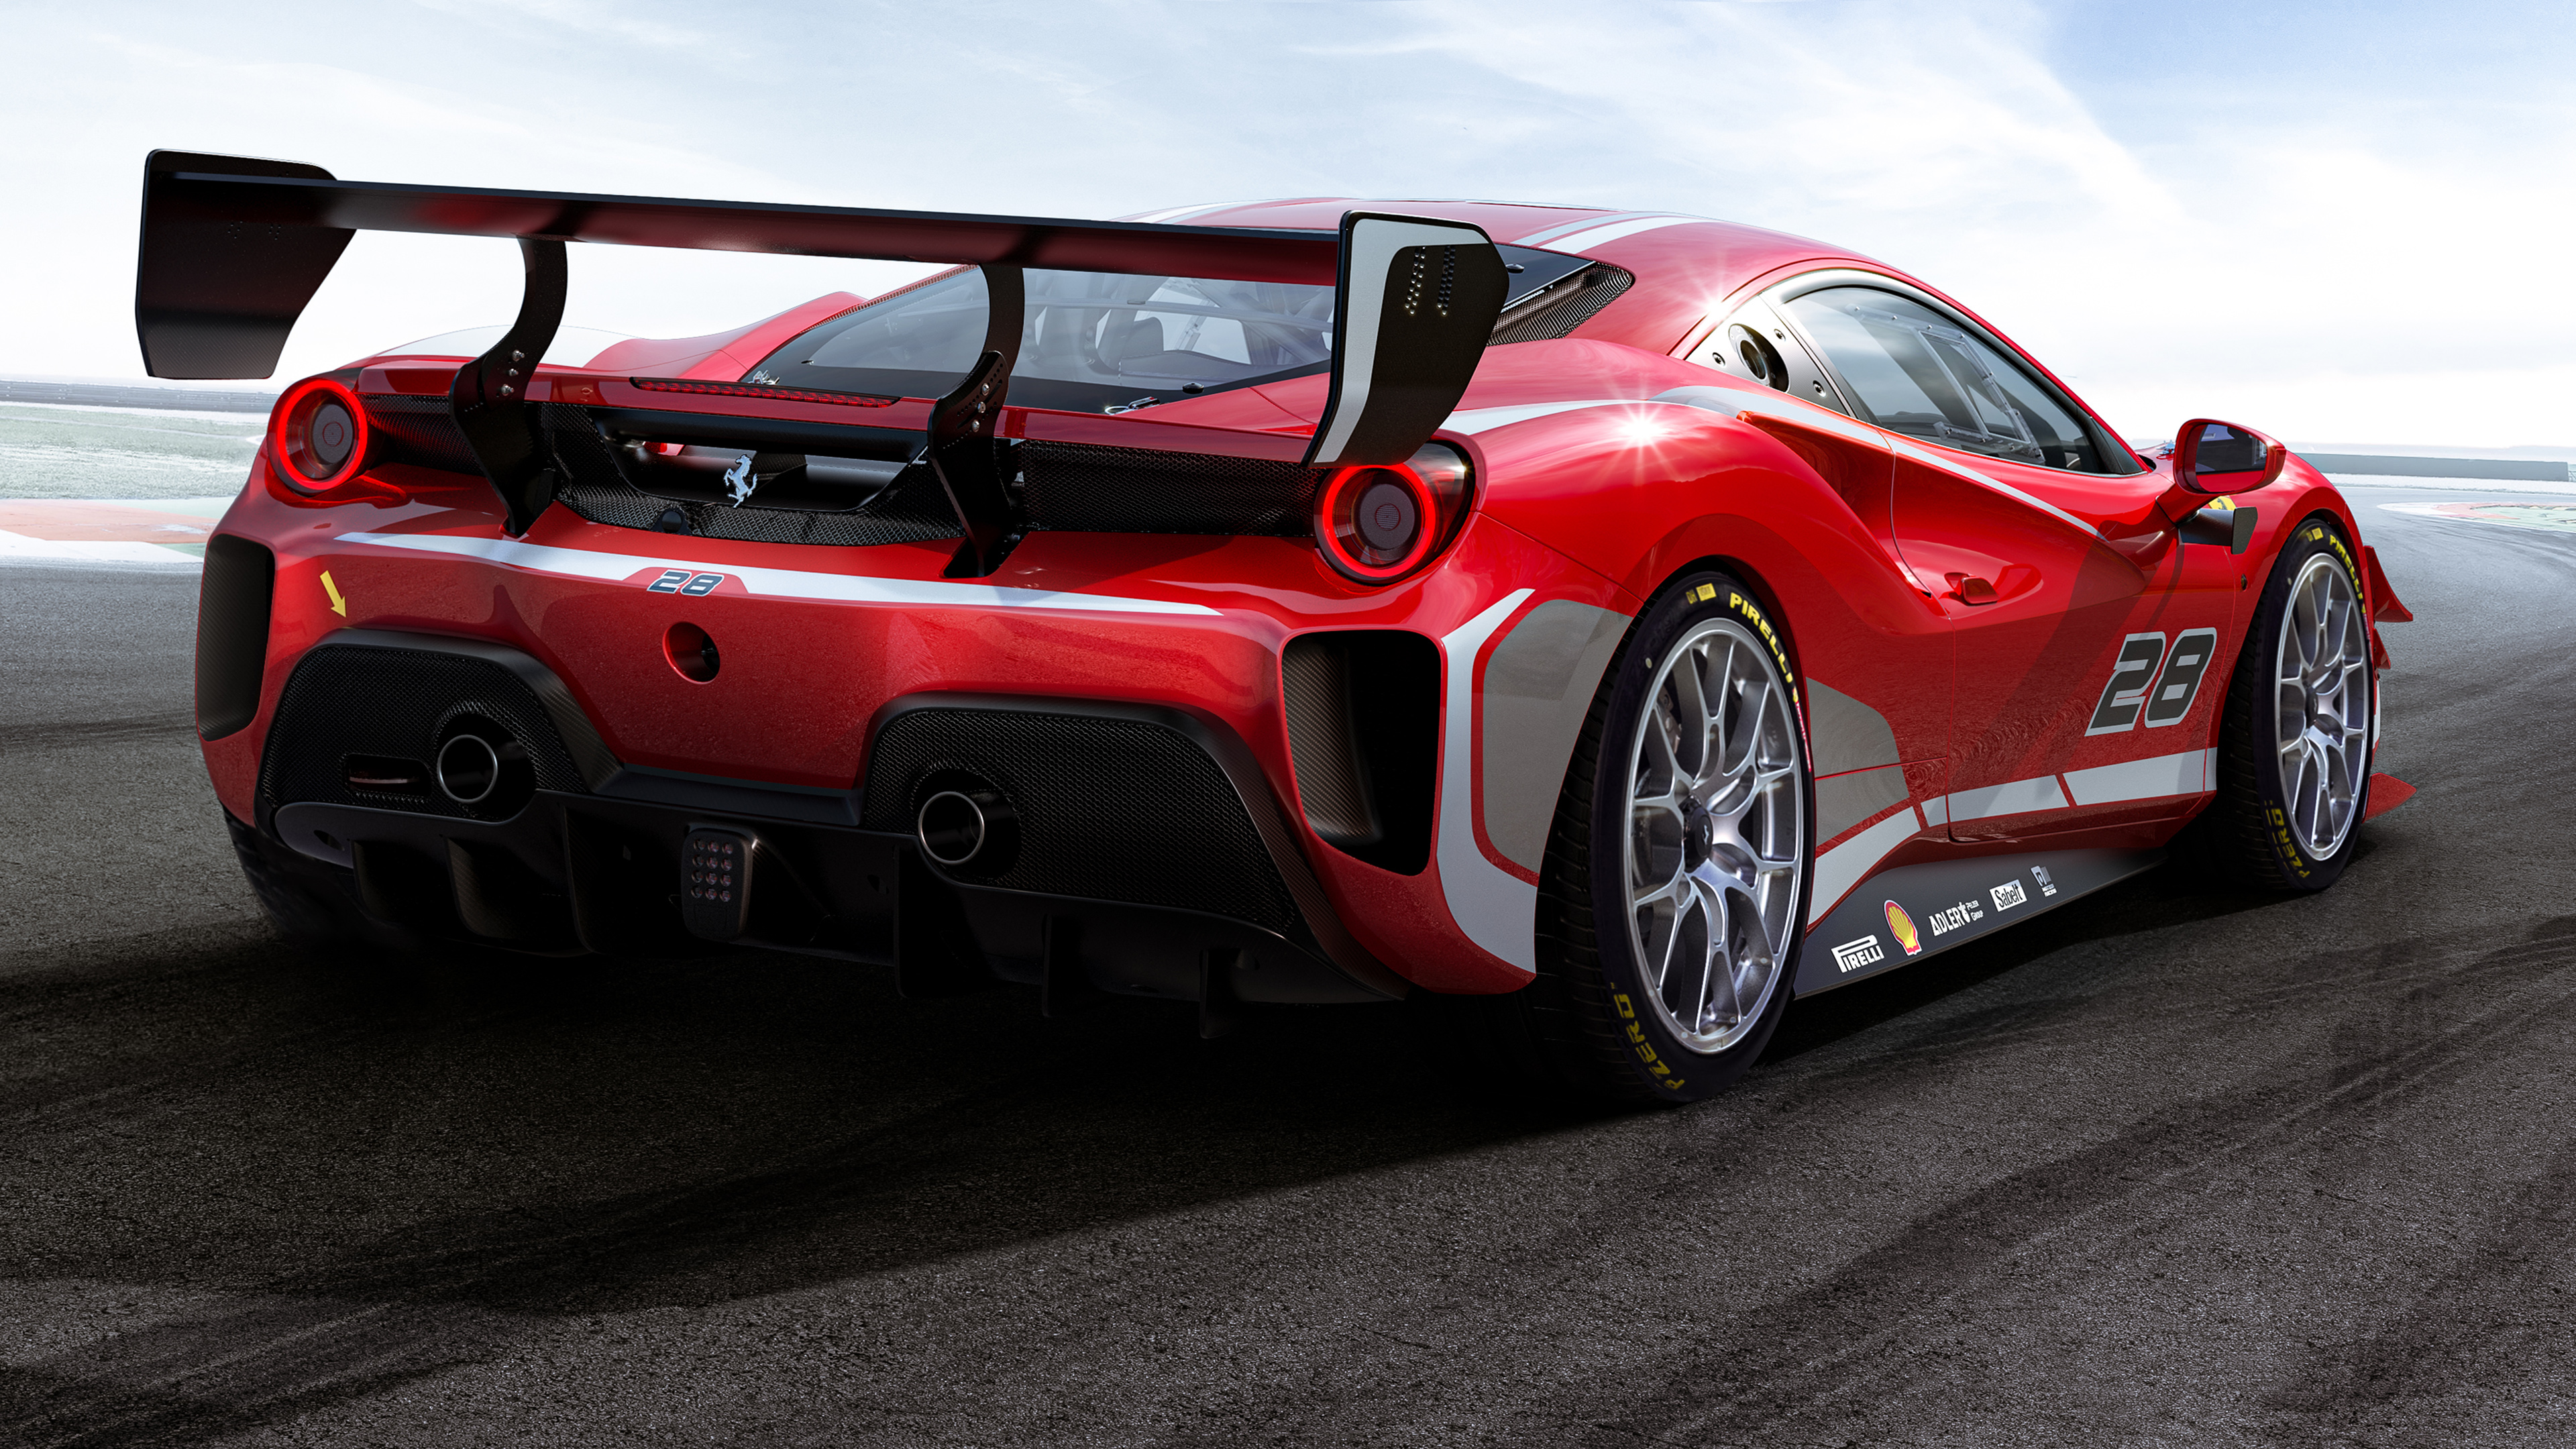 Ferrari 488 Challenge Evo 2020 4K Wallpaper HD Car Wallpapers 3840x2160